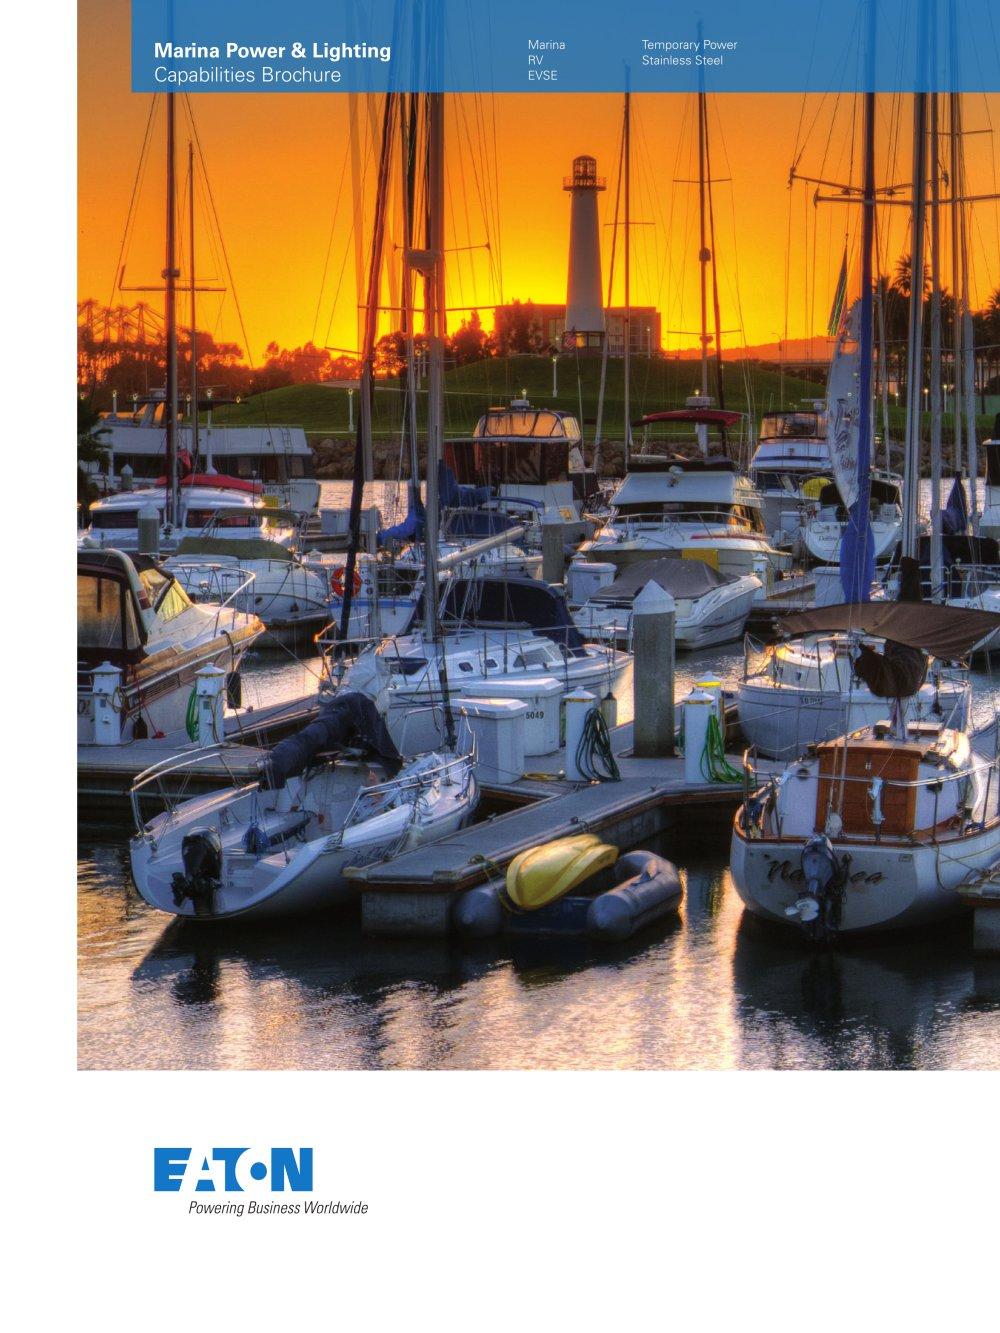 marina power and lighting capabilities brochure eaton pdf